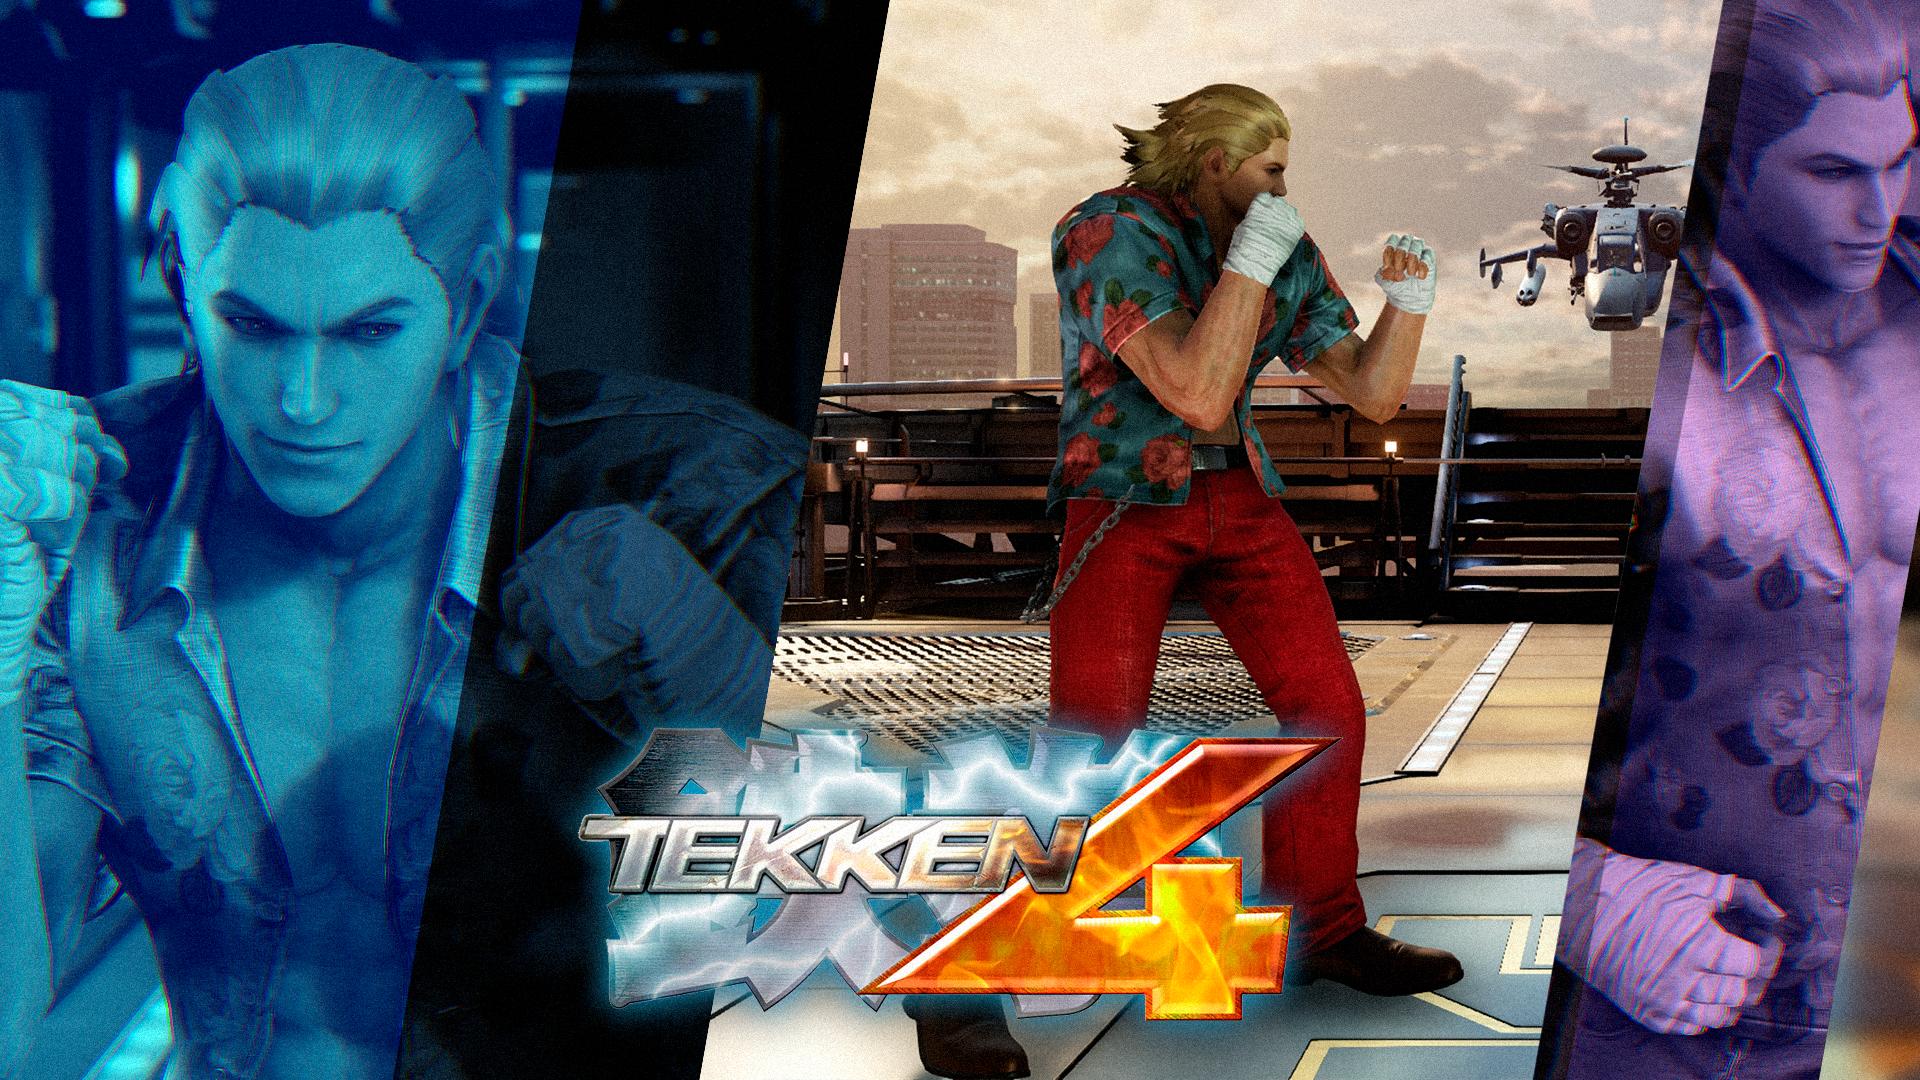 Tekken 4 Inspired Steve Fox By Mattplara On Deviantart